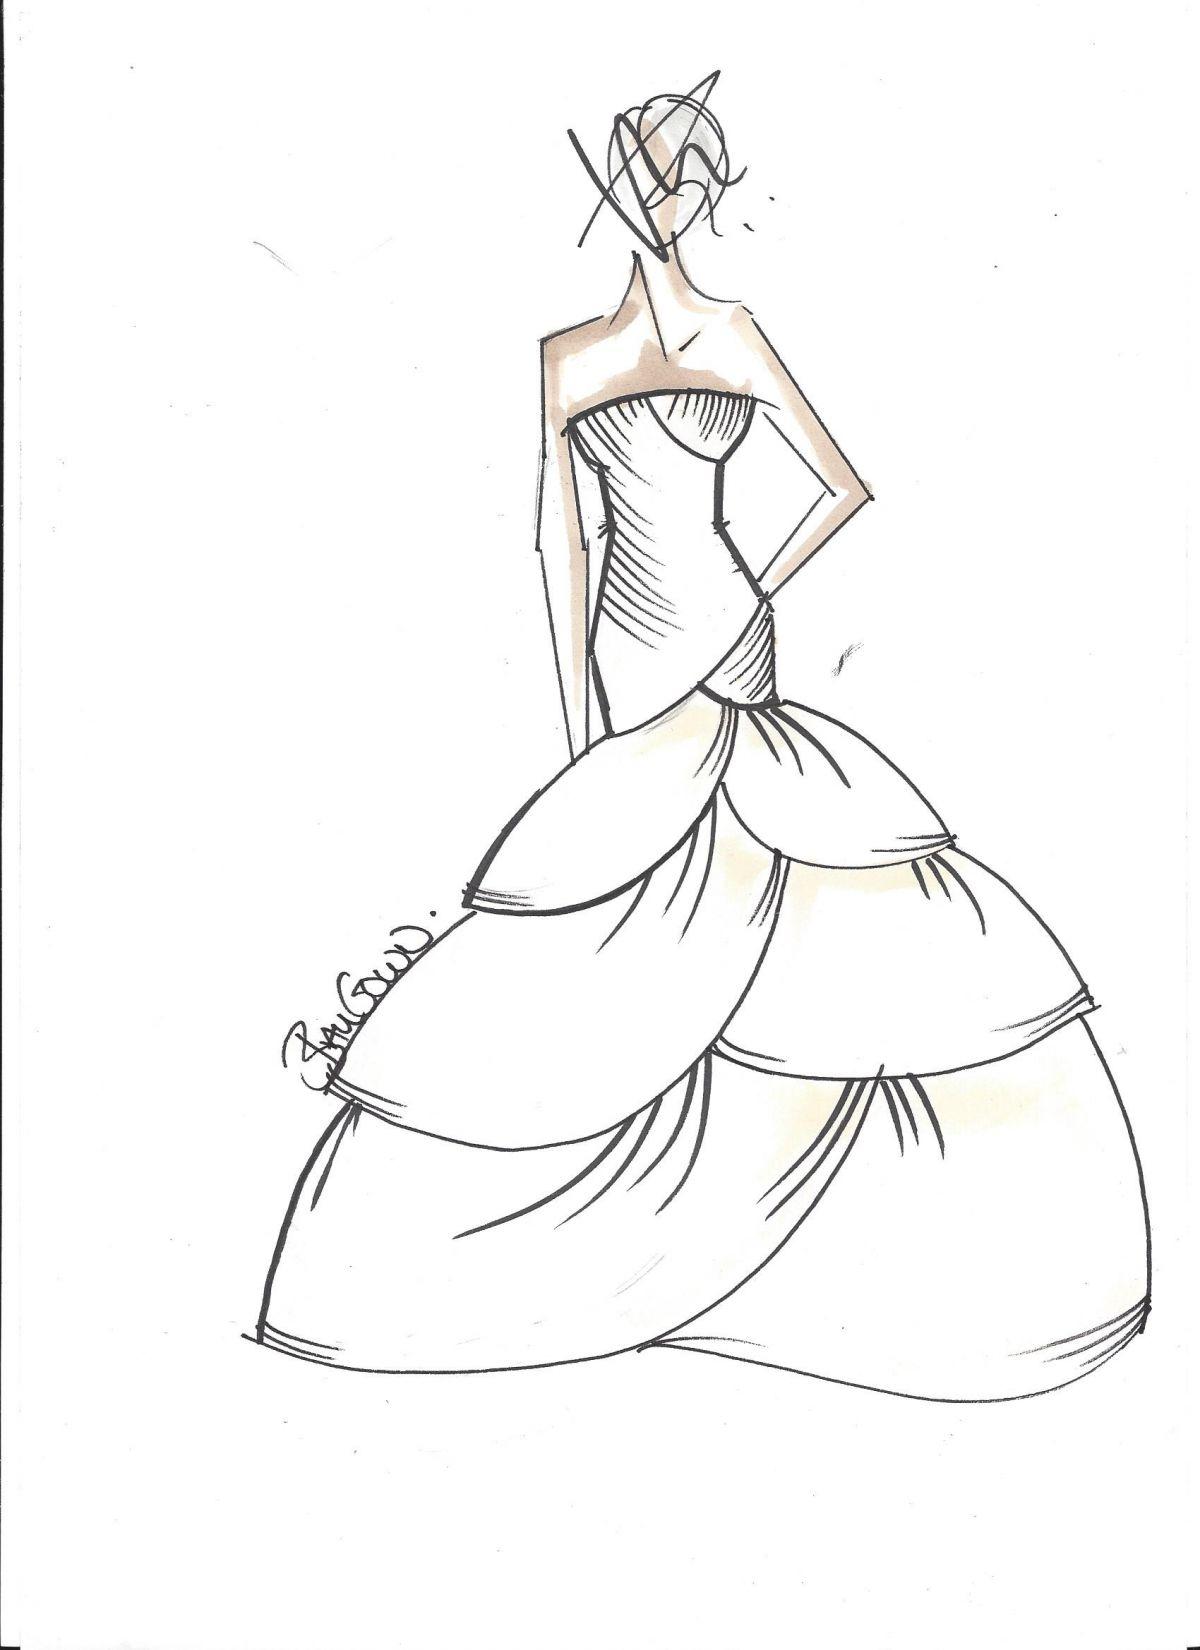 The Dress House Wedding Dress Silhouette Guide | The Dress House